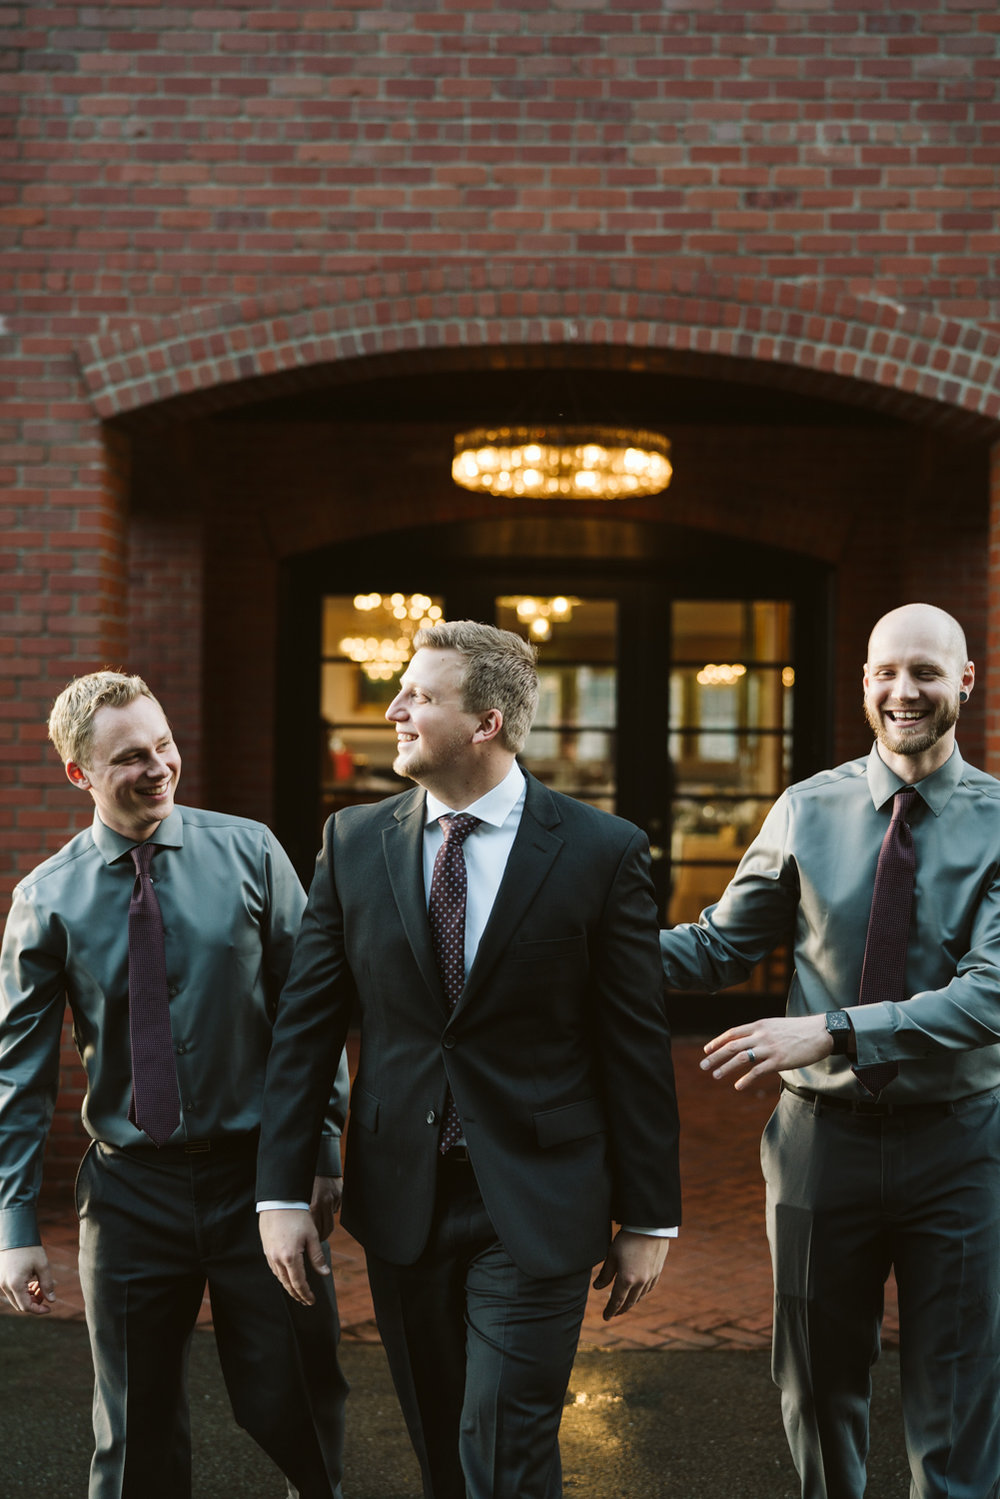 Intimate Winter Wedding | Groomsmen Photos | Seattle wedding photographer